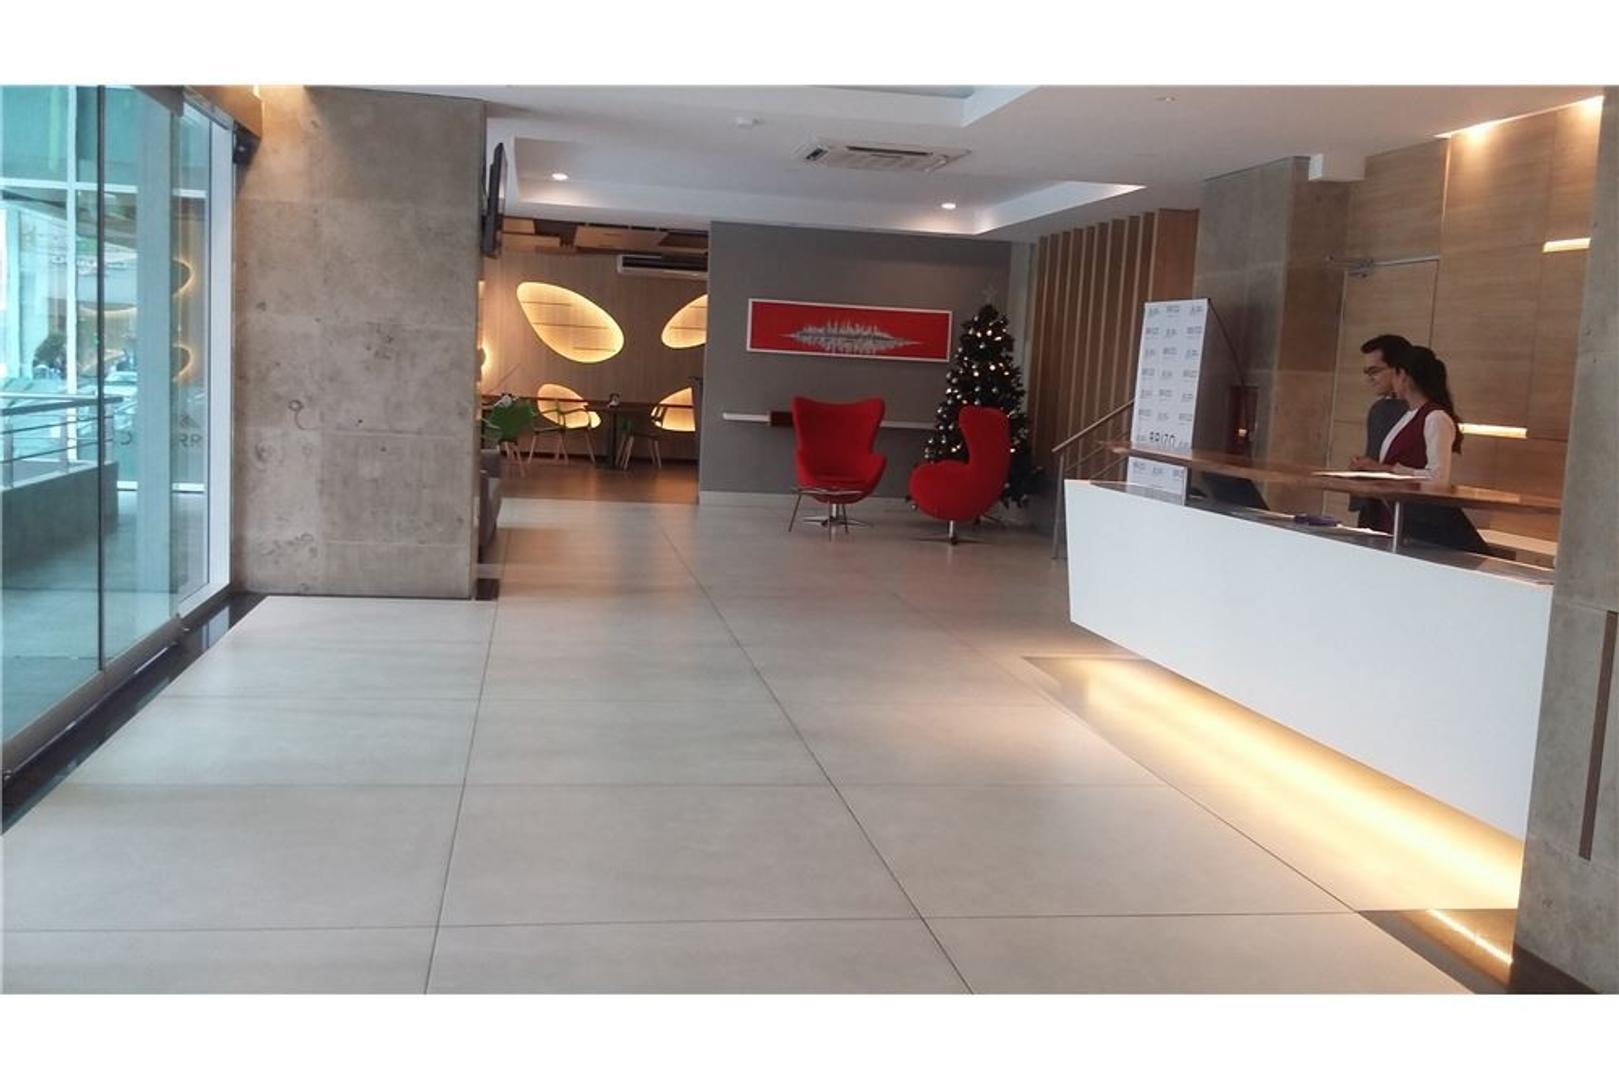 Mono Ambiente  Cadena hotelera ( Inversionista)